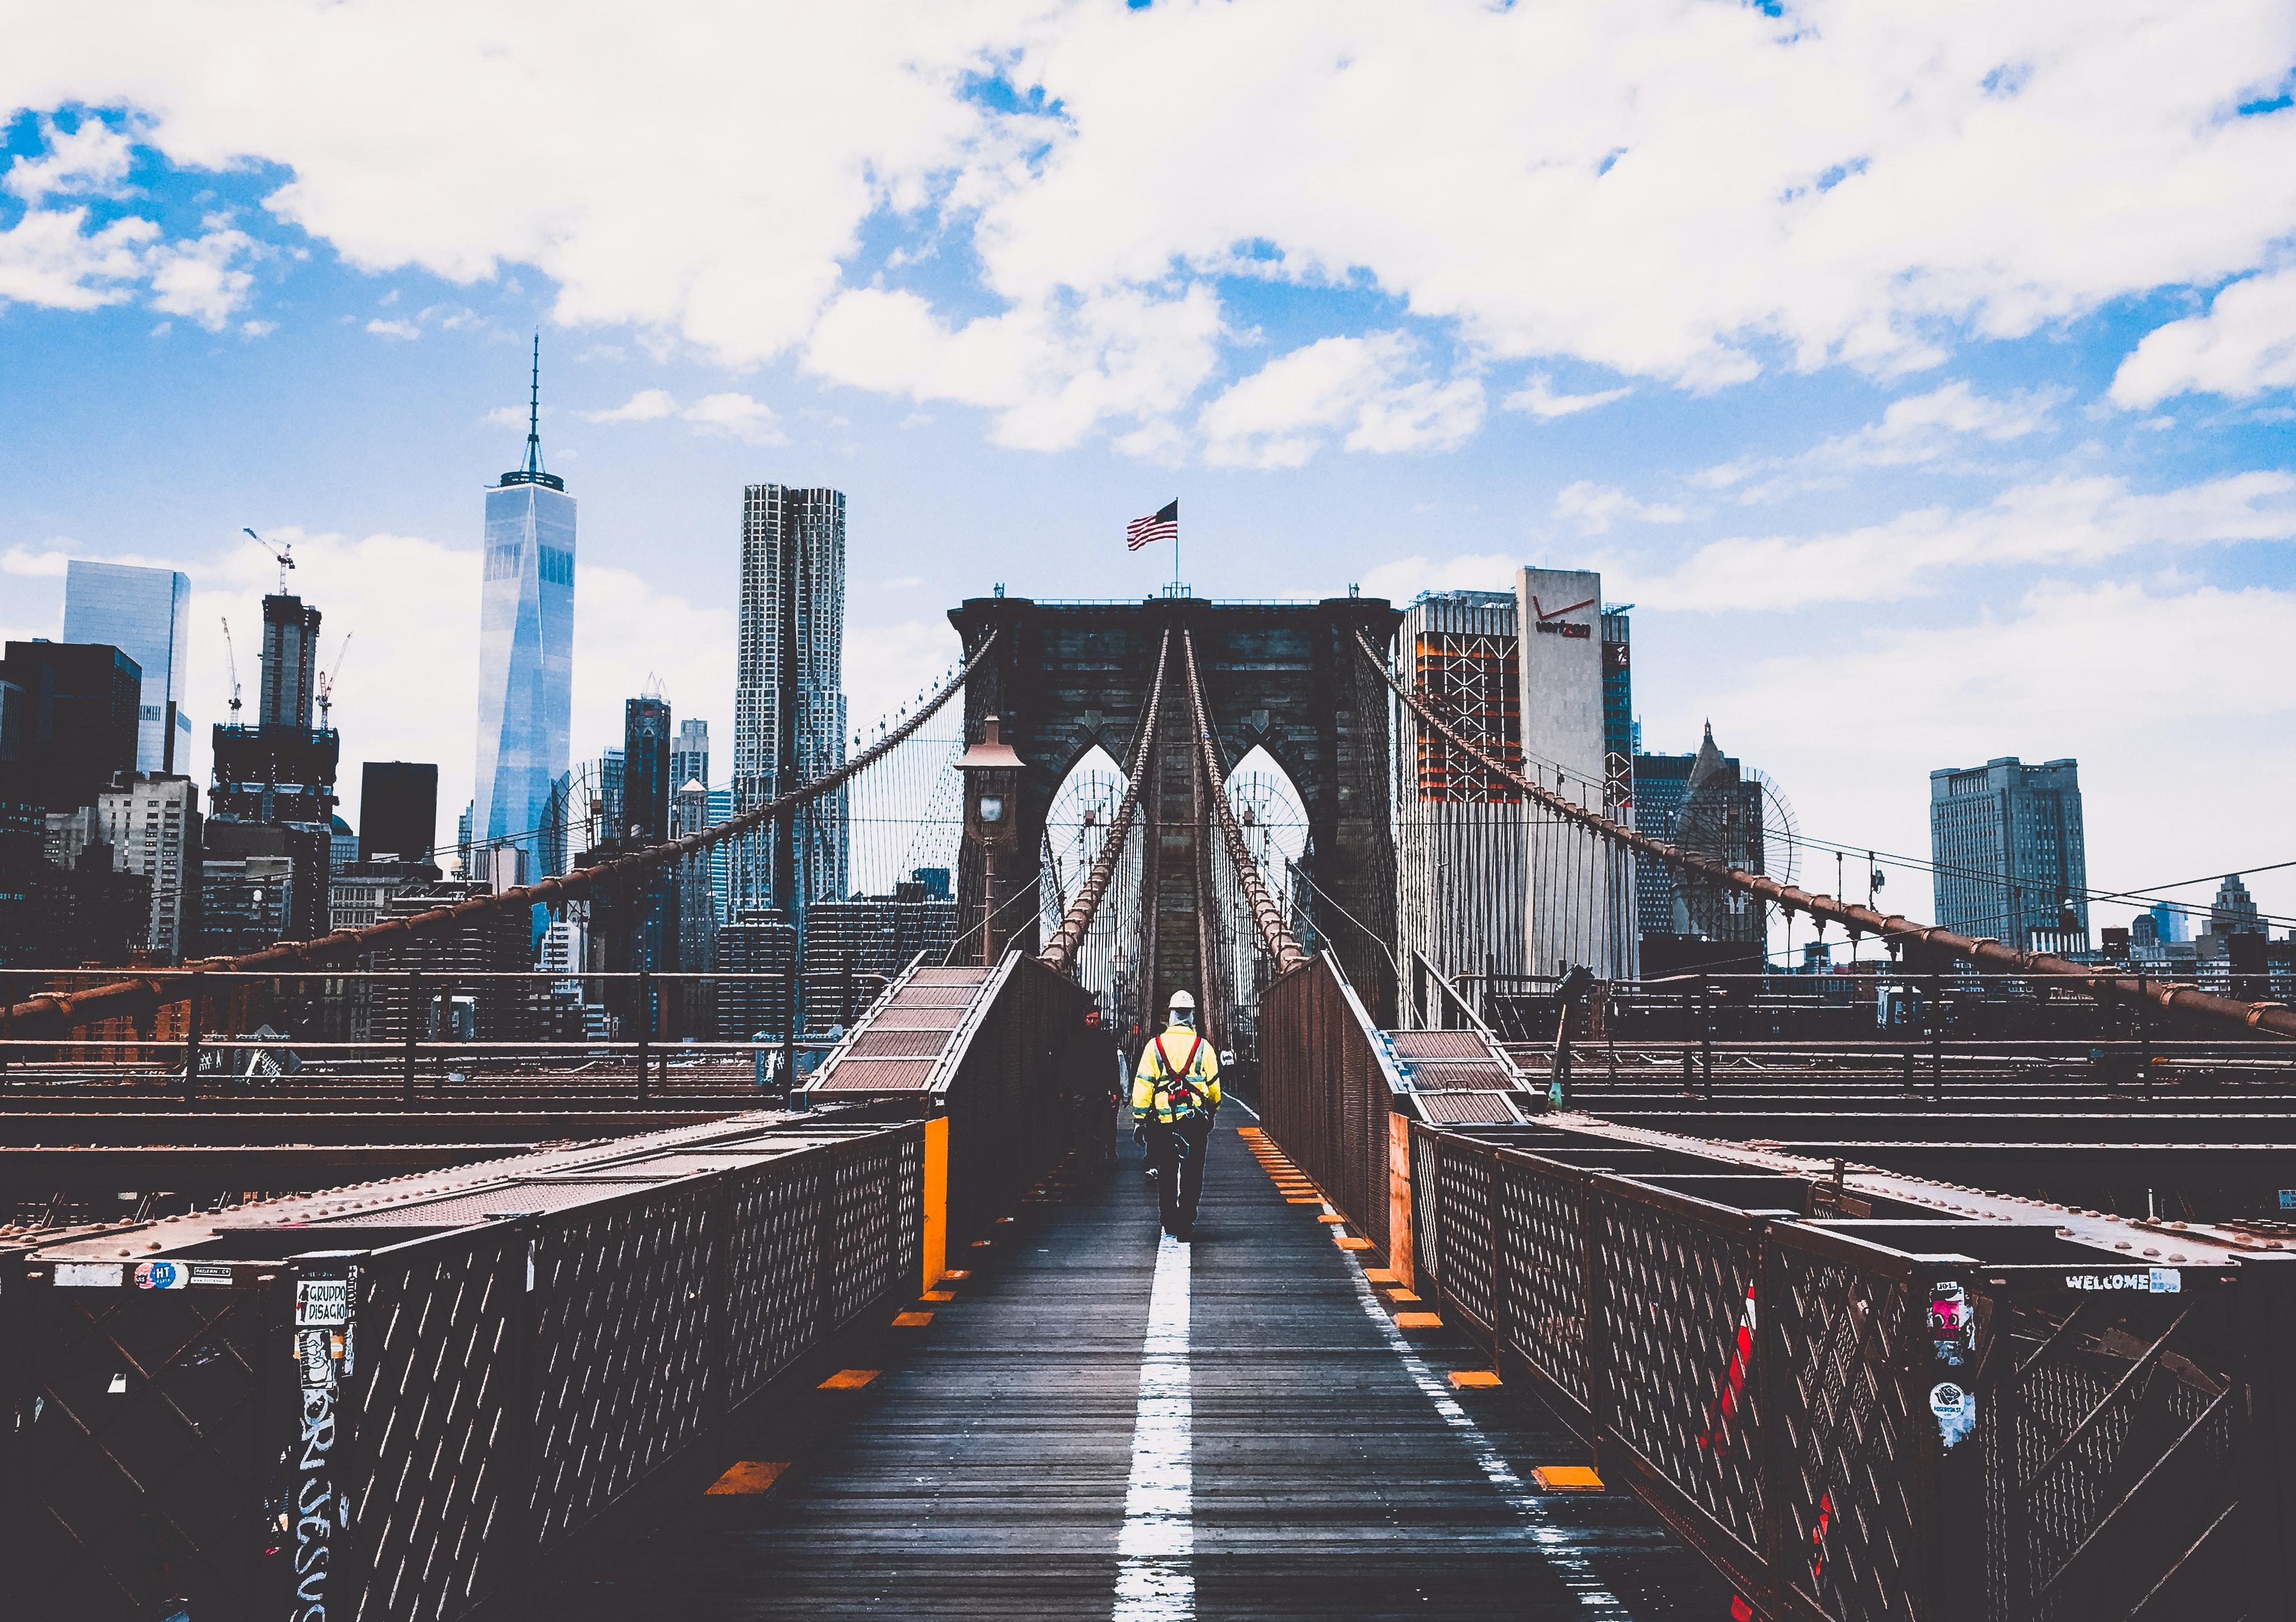 Man Waling on Bridge · Free Stock Photo